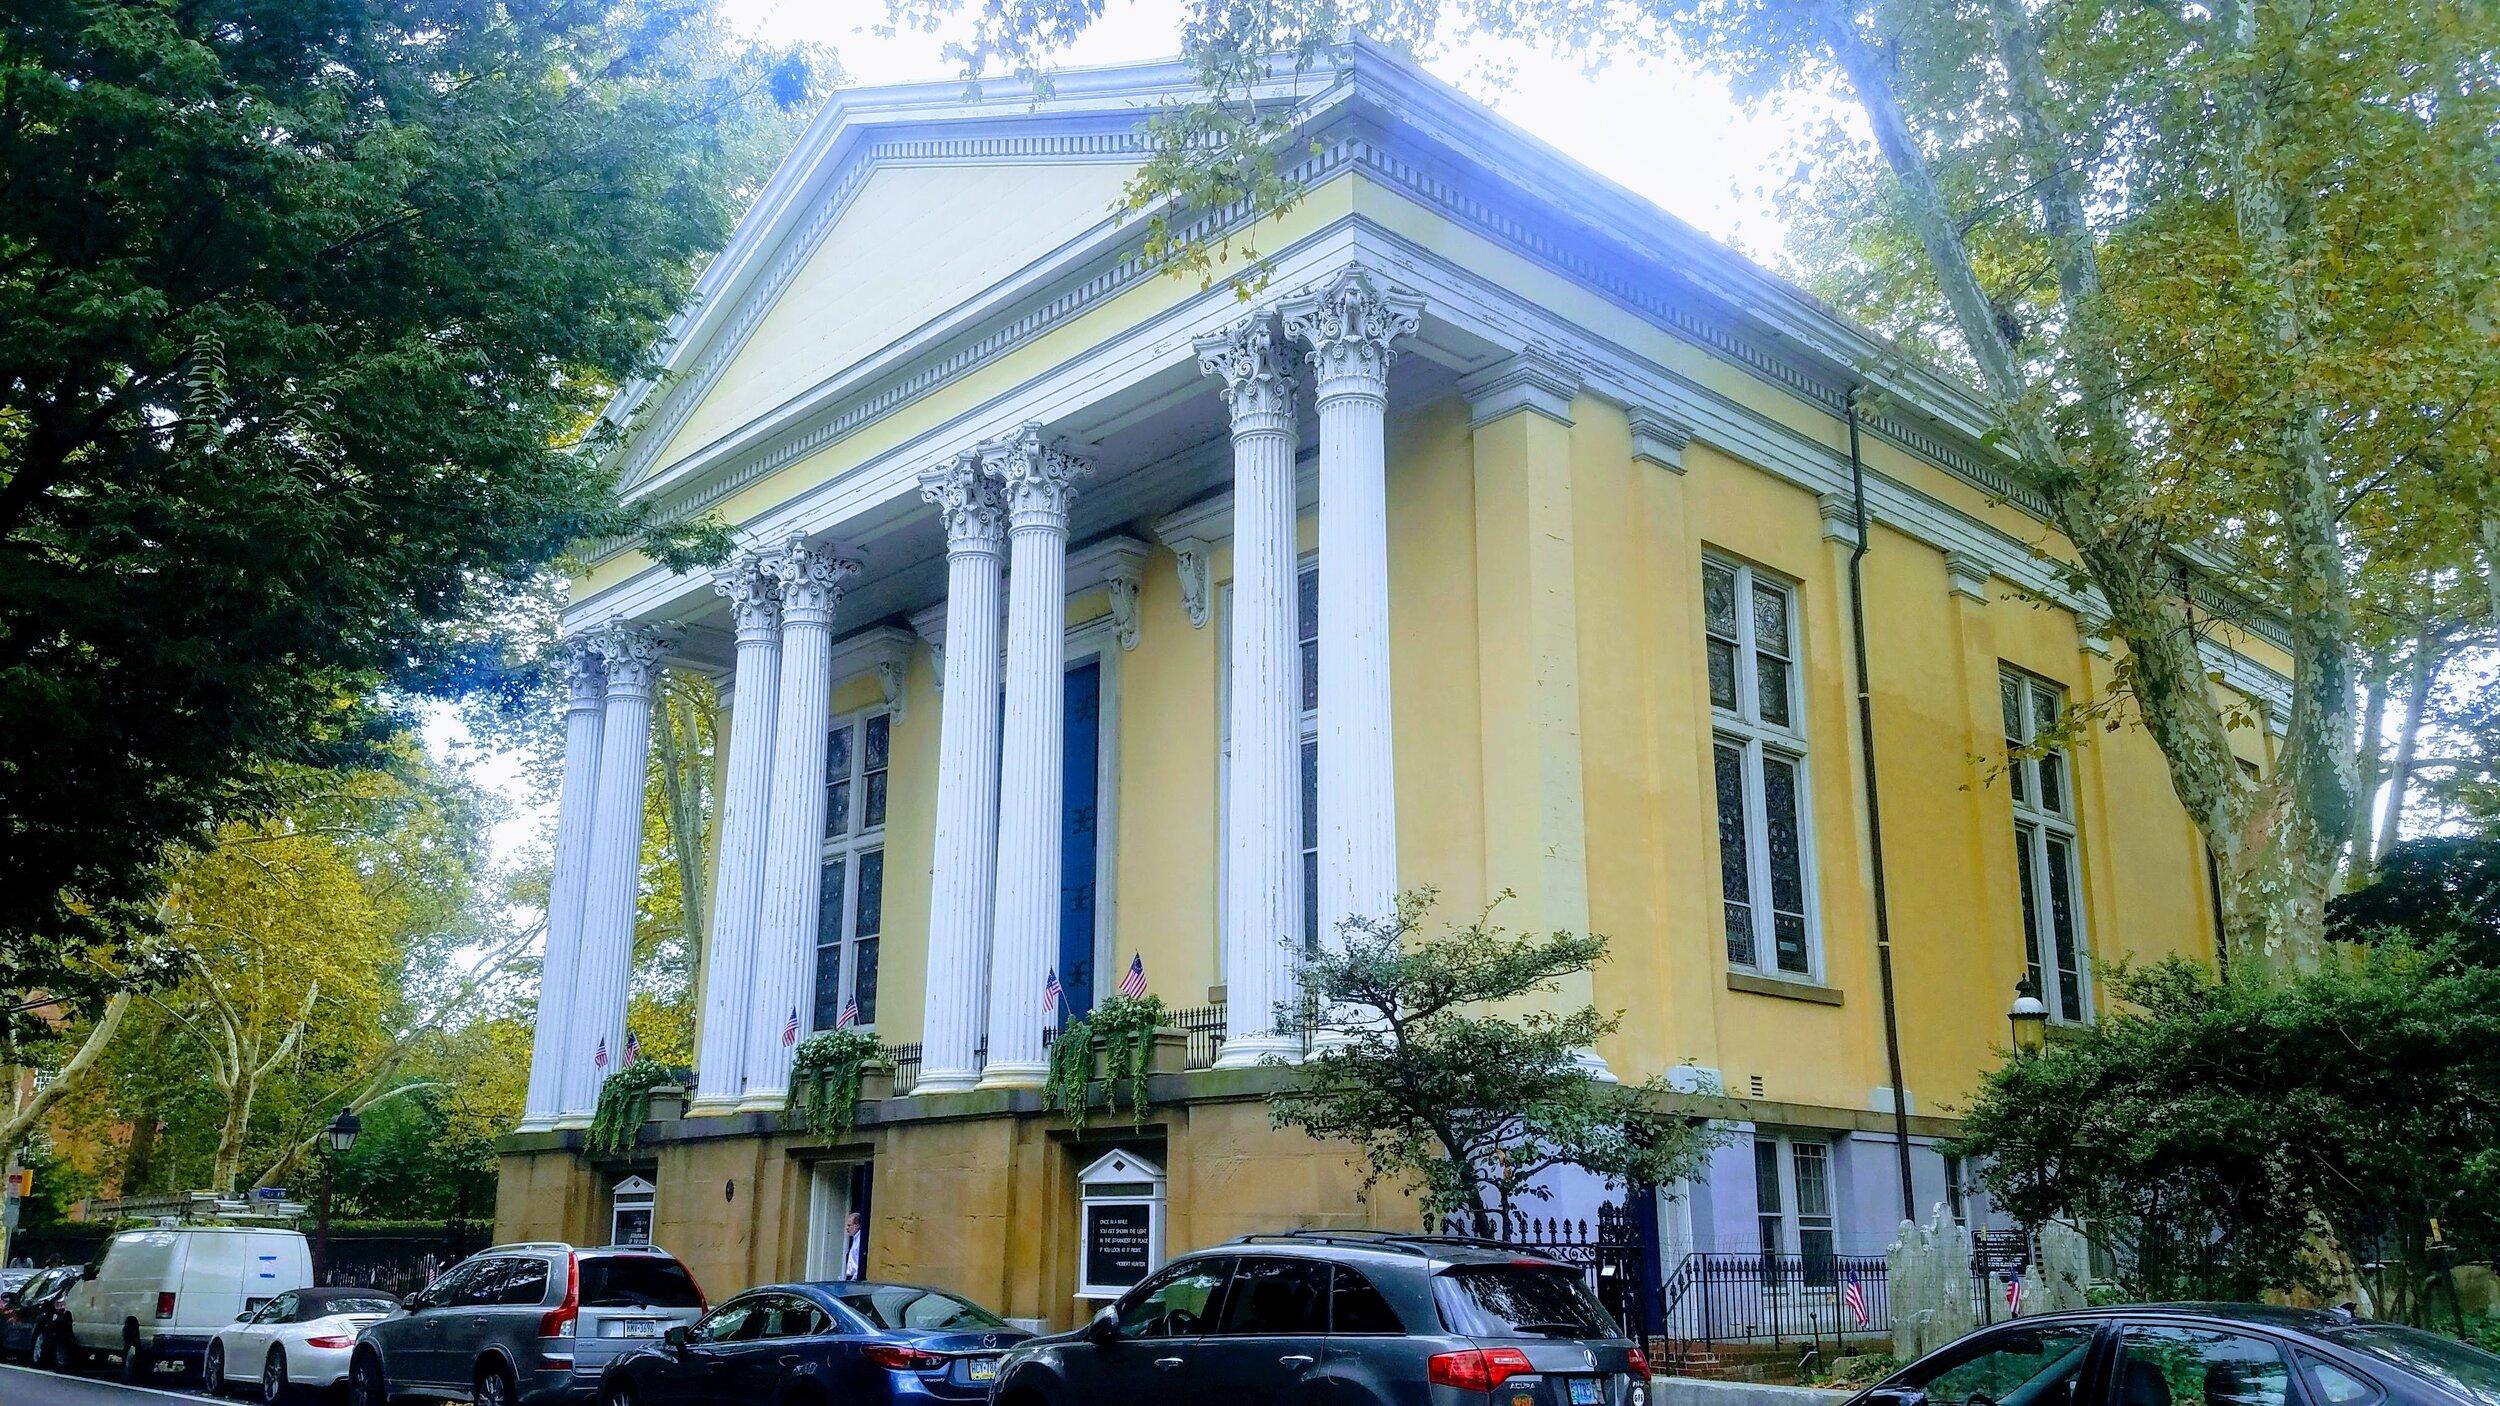 Old Pine Street Presbyterian Church, Philadelphia, Pennsylvania (photo credit: R. Andrew Myers).